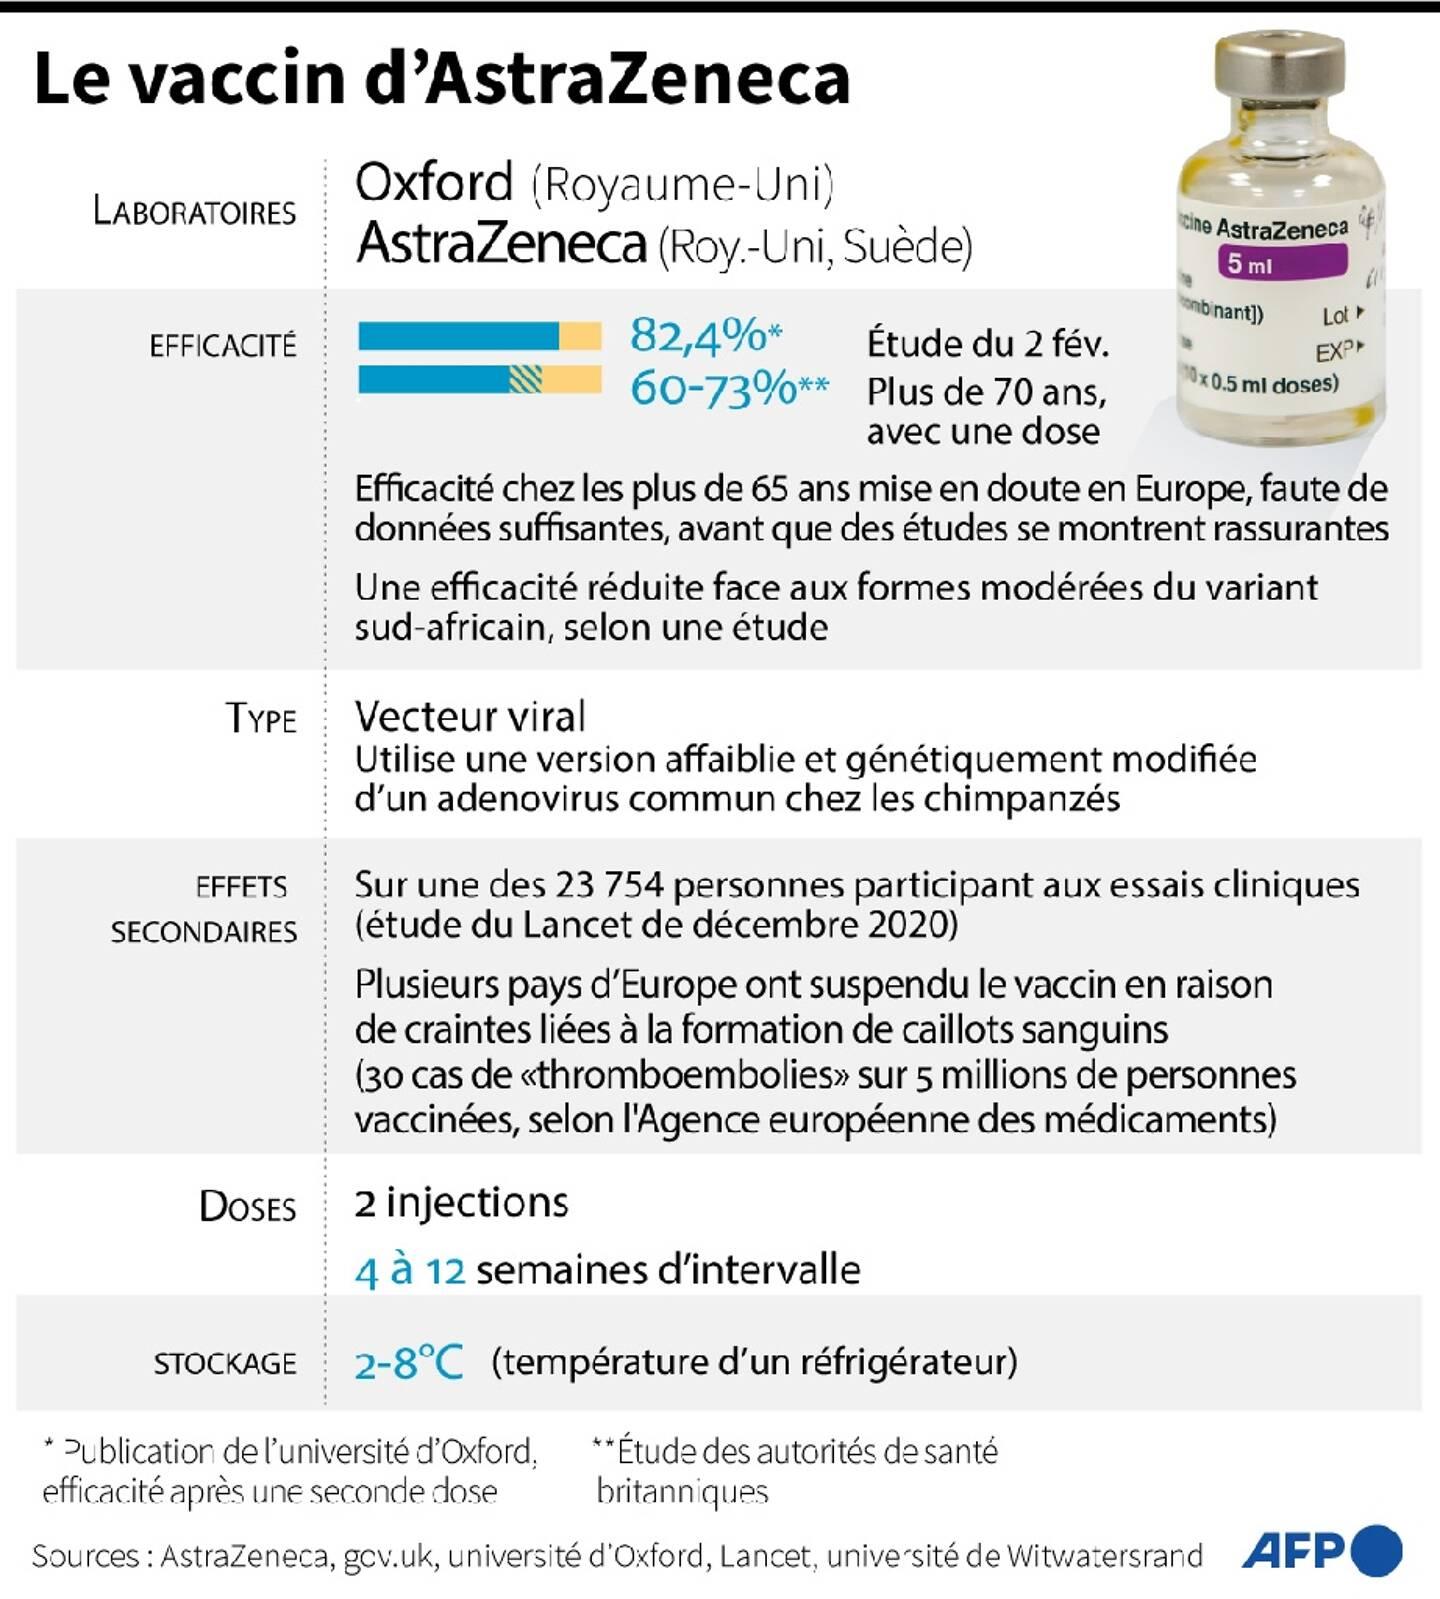 Informations essentielles concernant le vaccin AstraZeneca